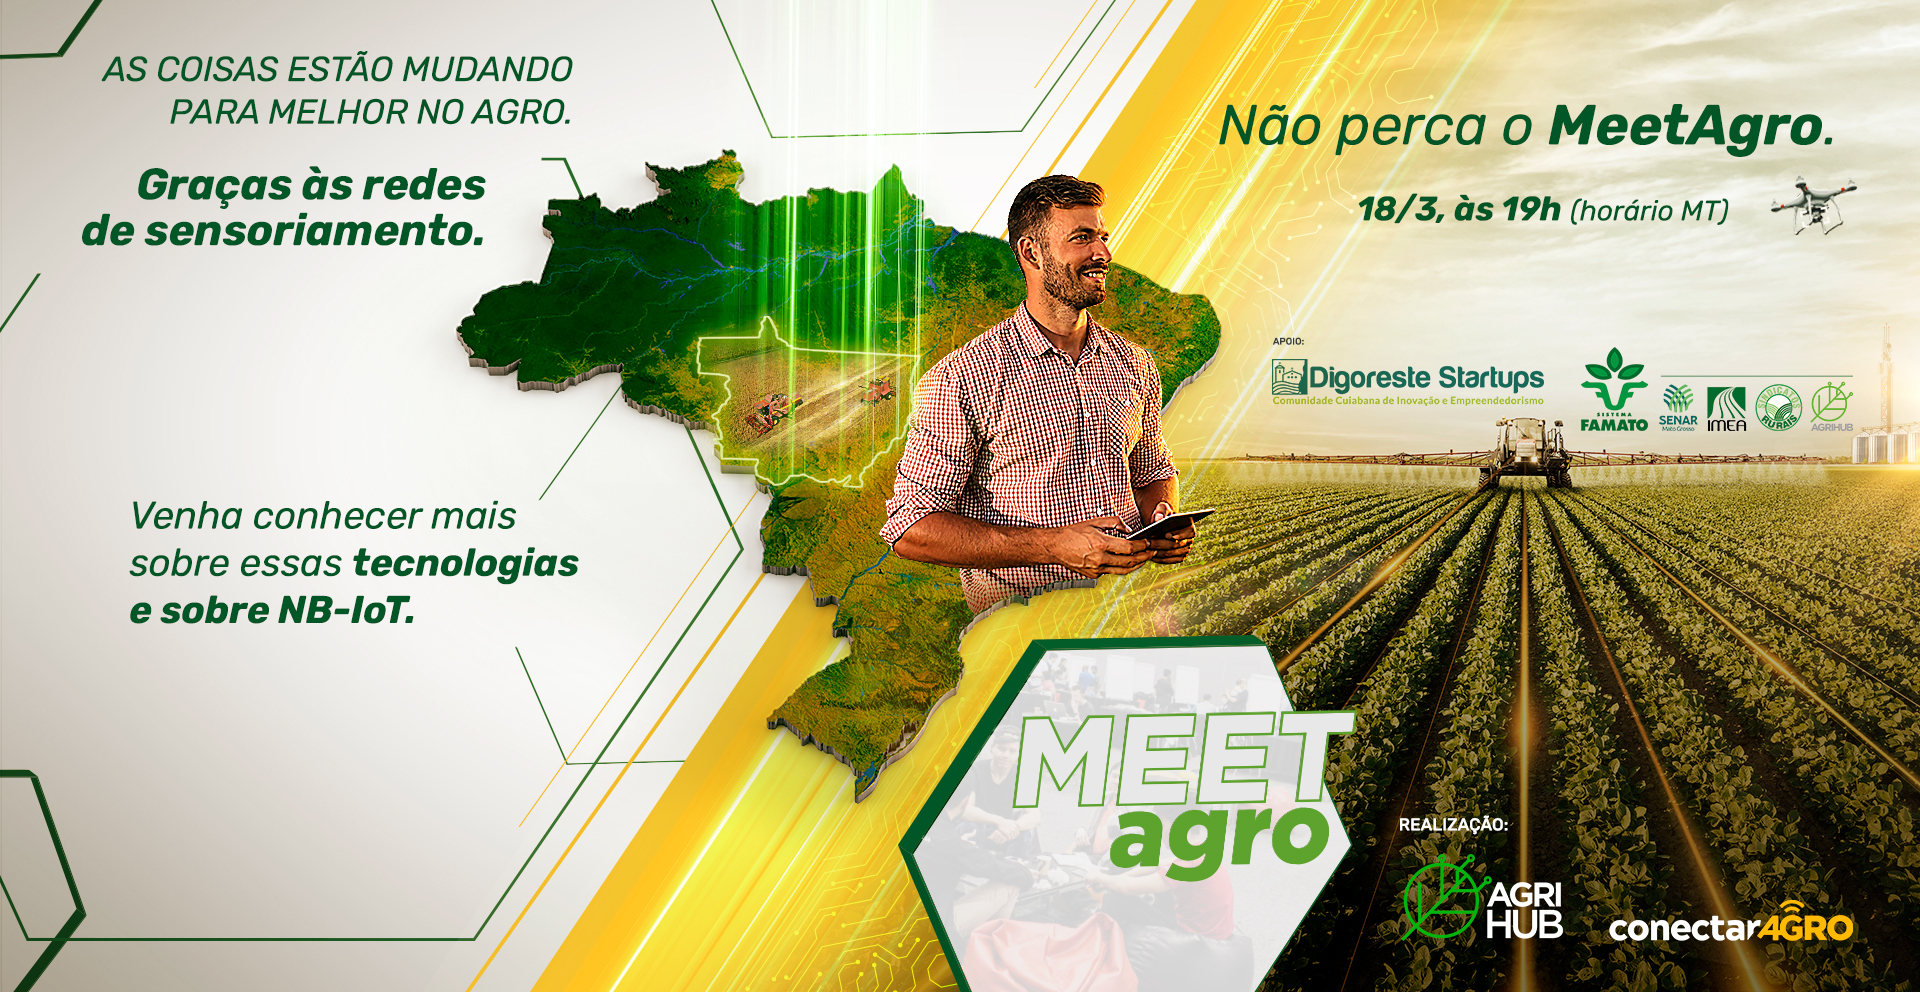 AgriHub e ConectarAGRO realizam MeeAgro virtual sobre IoT